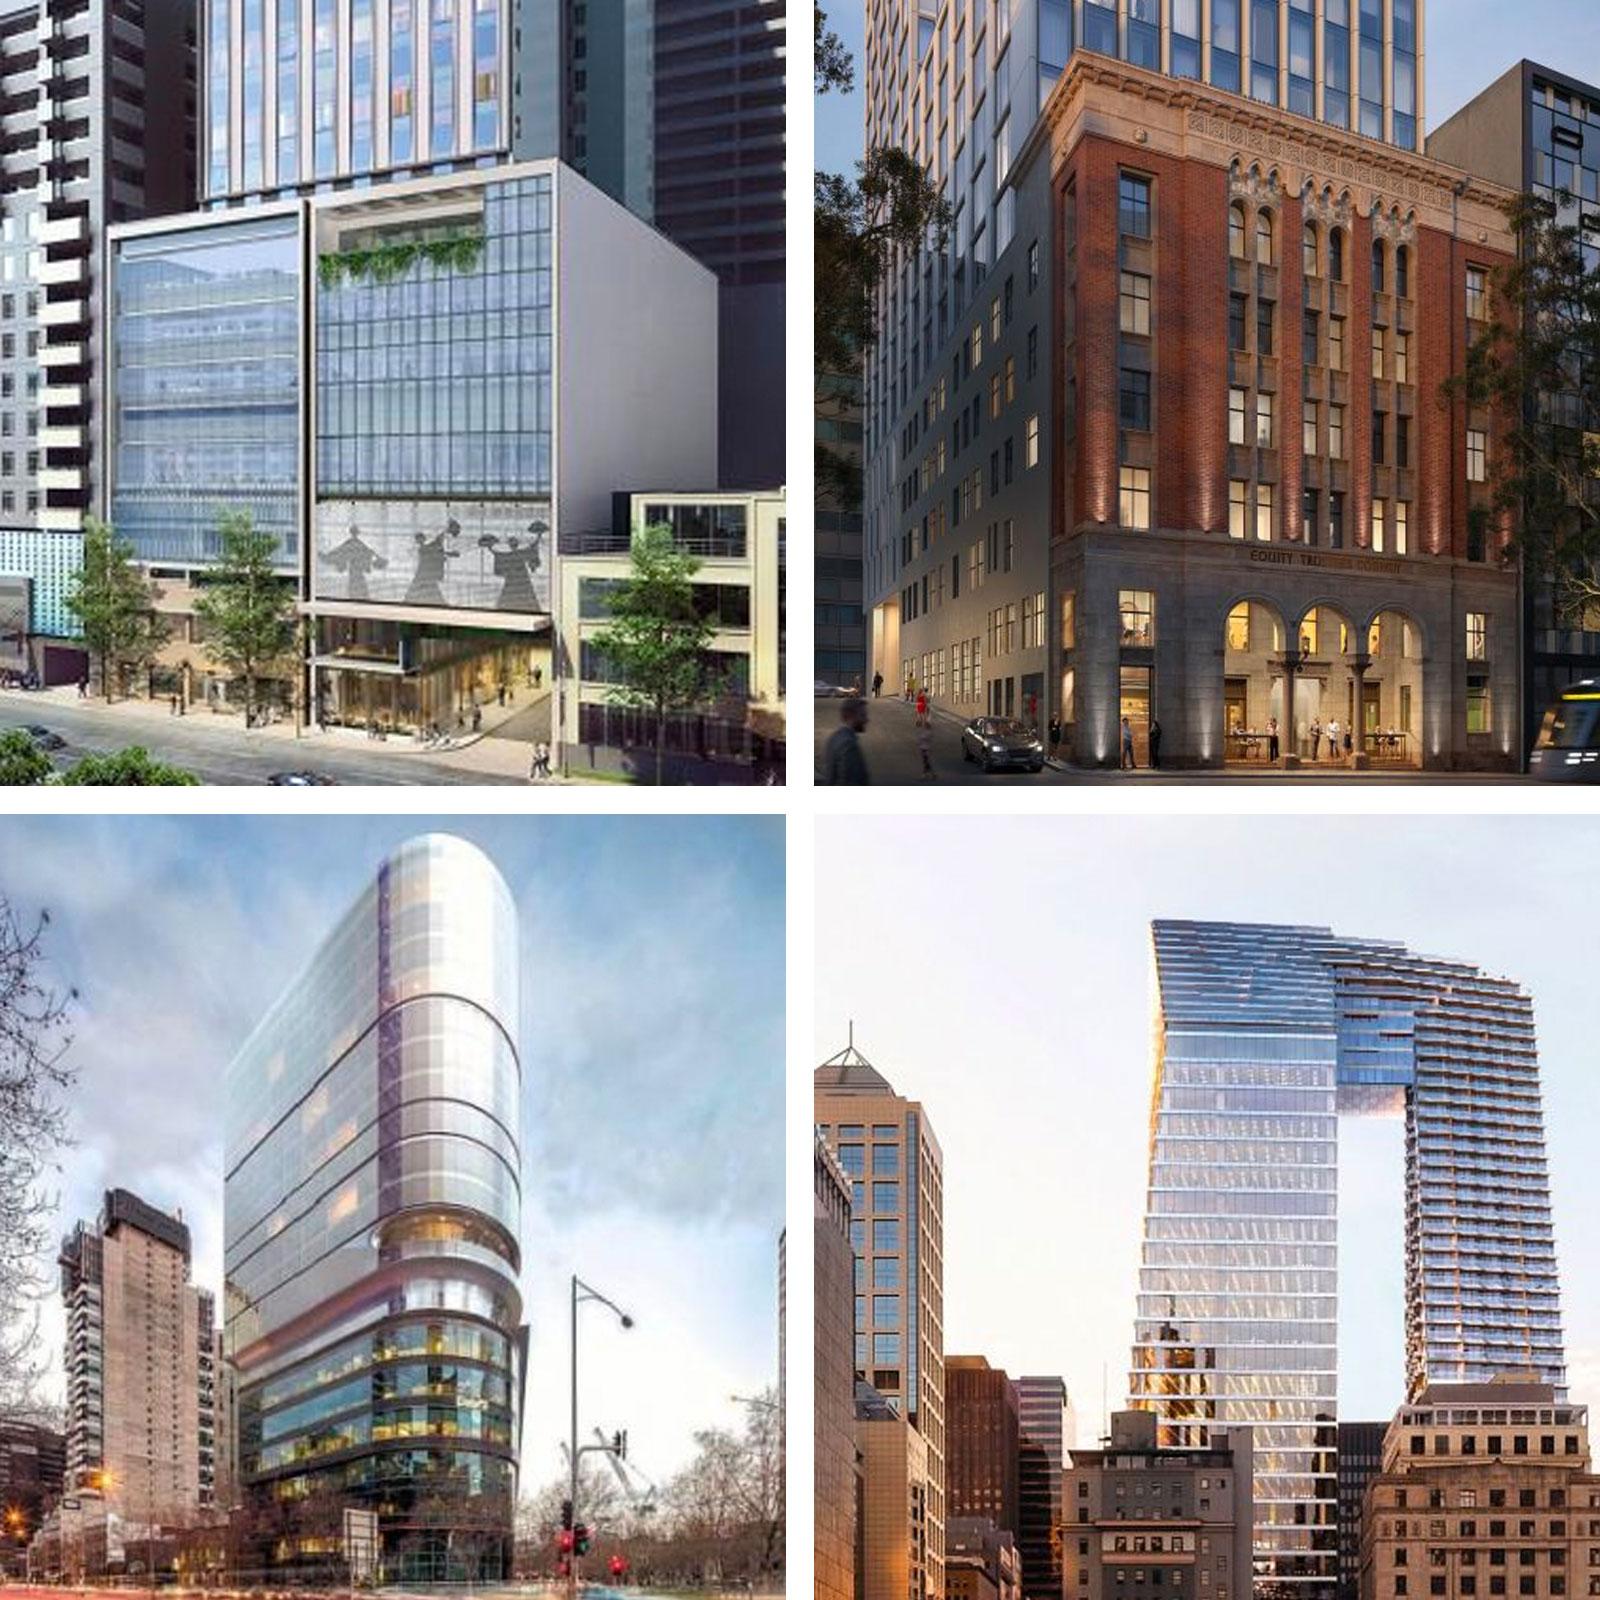 Hotels under construction in Melbourne:   Hilton Melbourne Little Queen Street (top right),